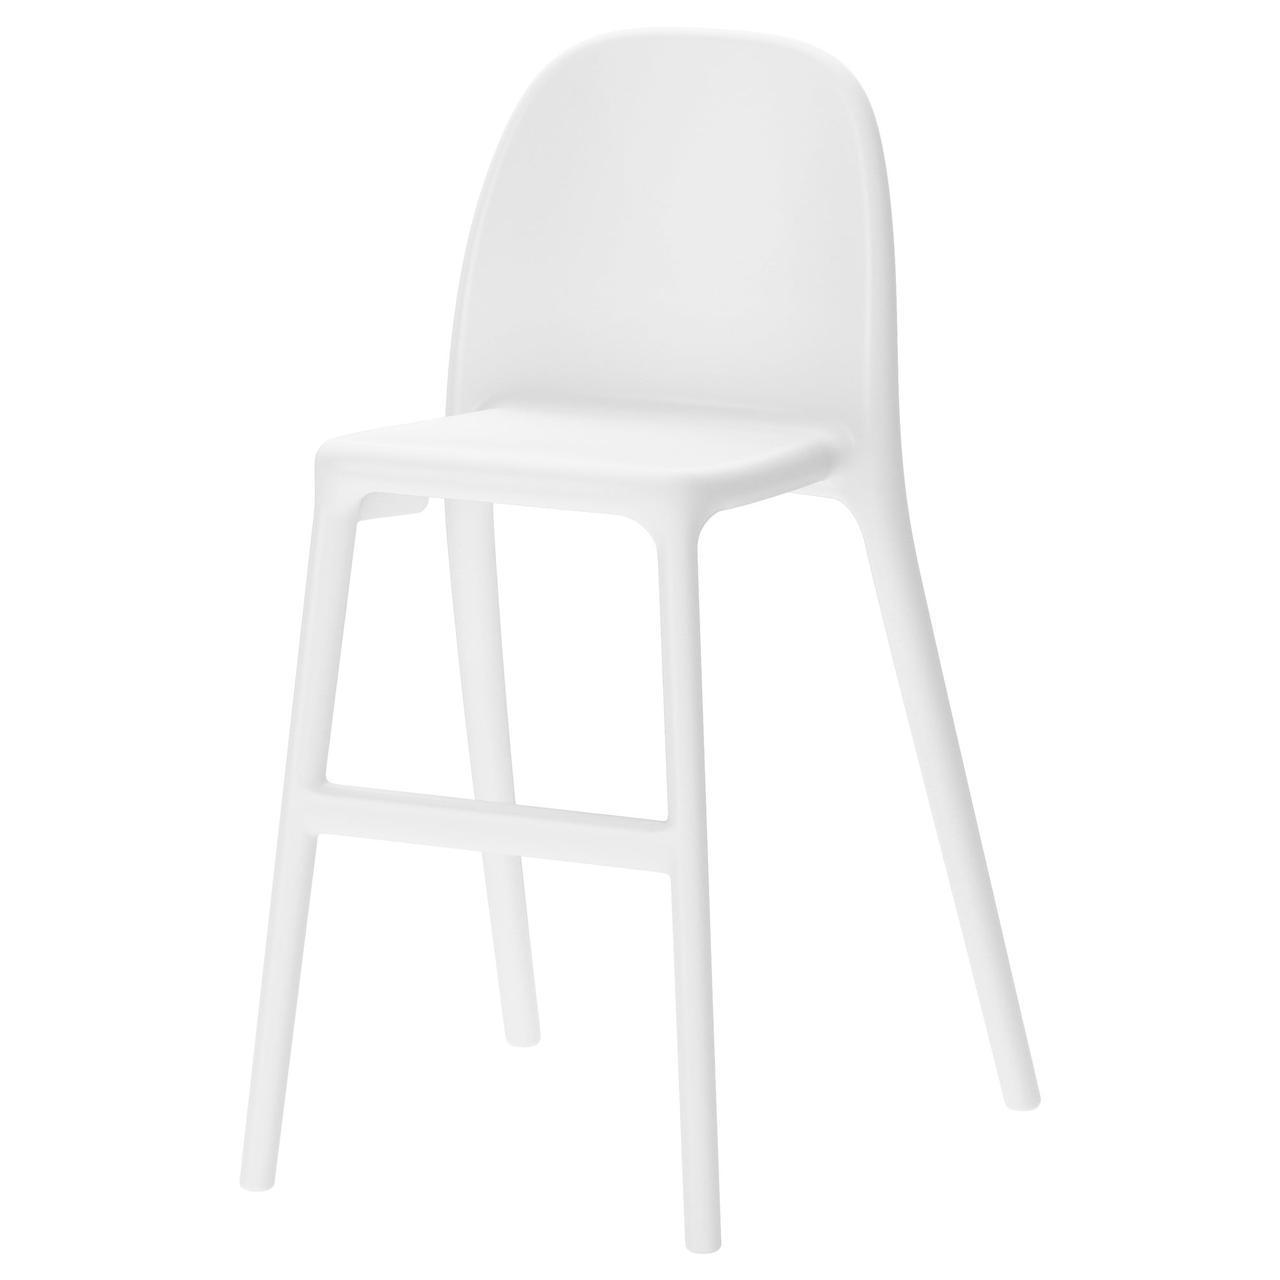 IKEA URBAN Детский стул, белизна  (001.652.13)